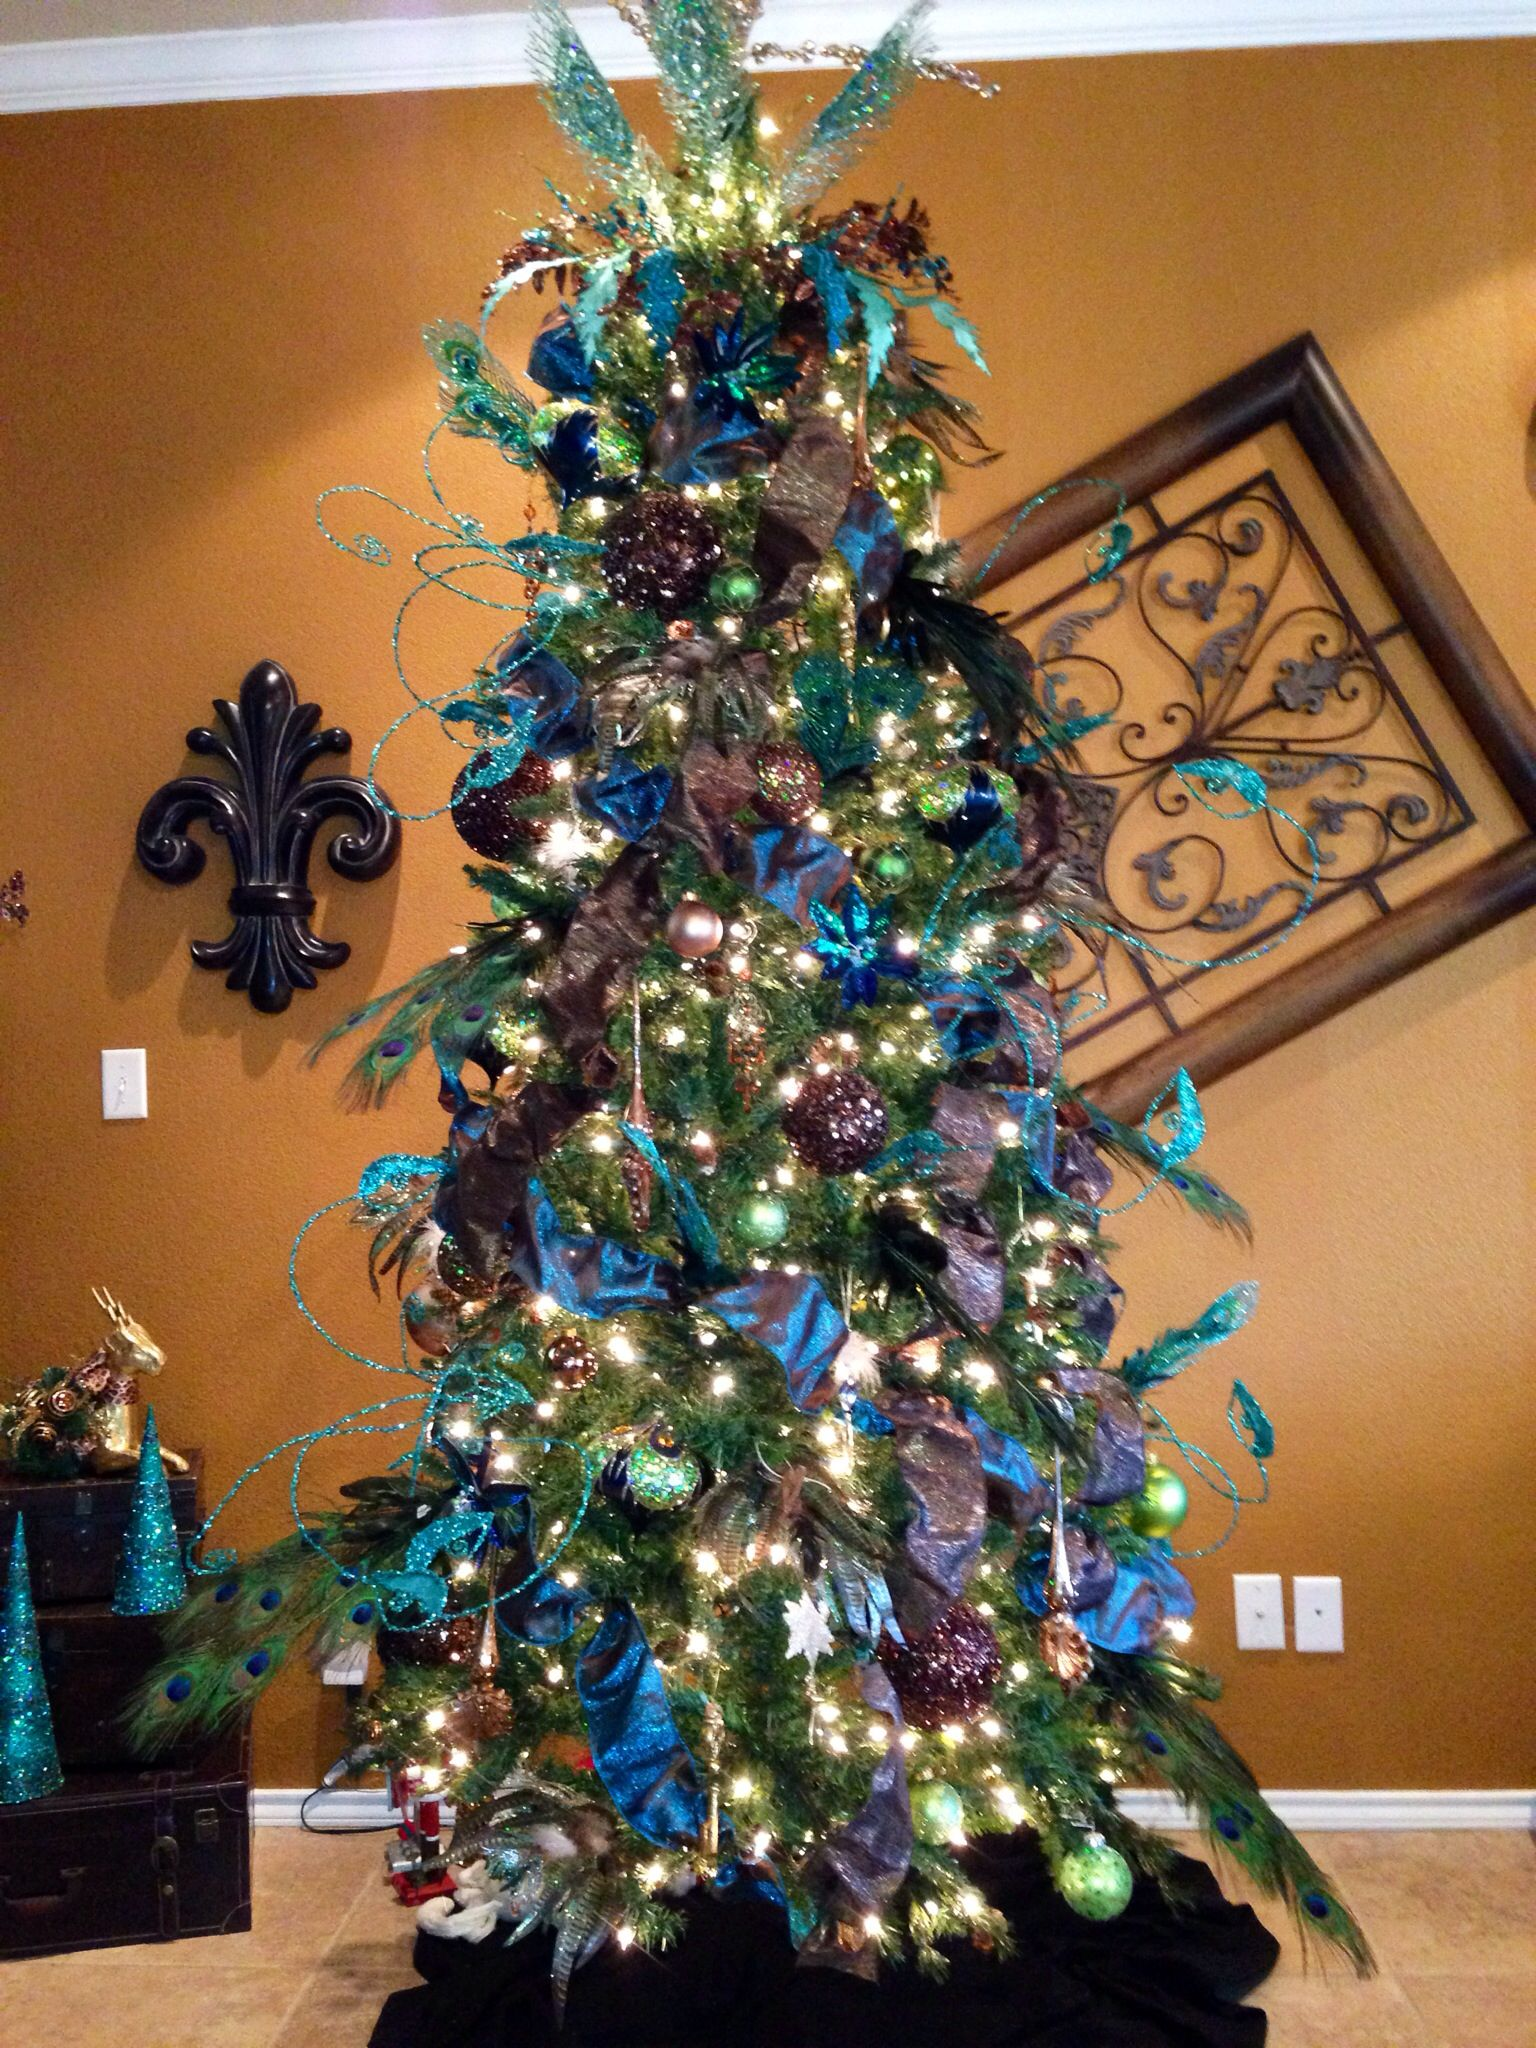 Christmas Tree/decor Christmas tree decorations